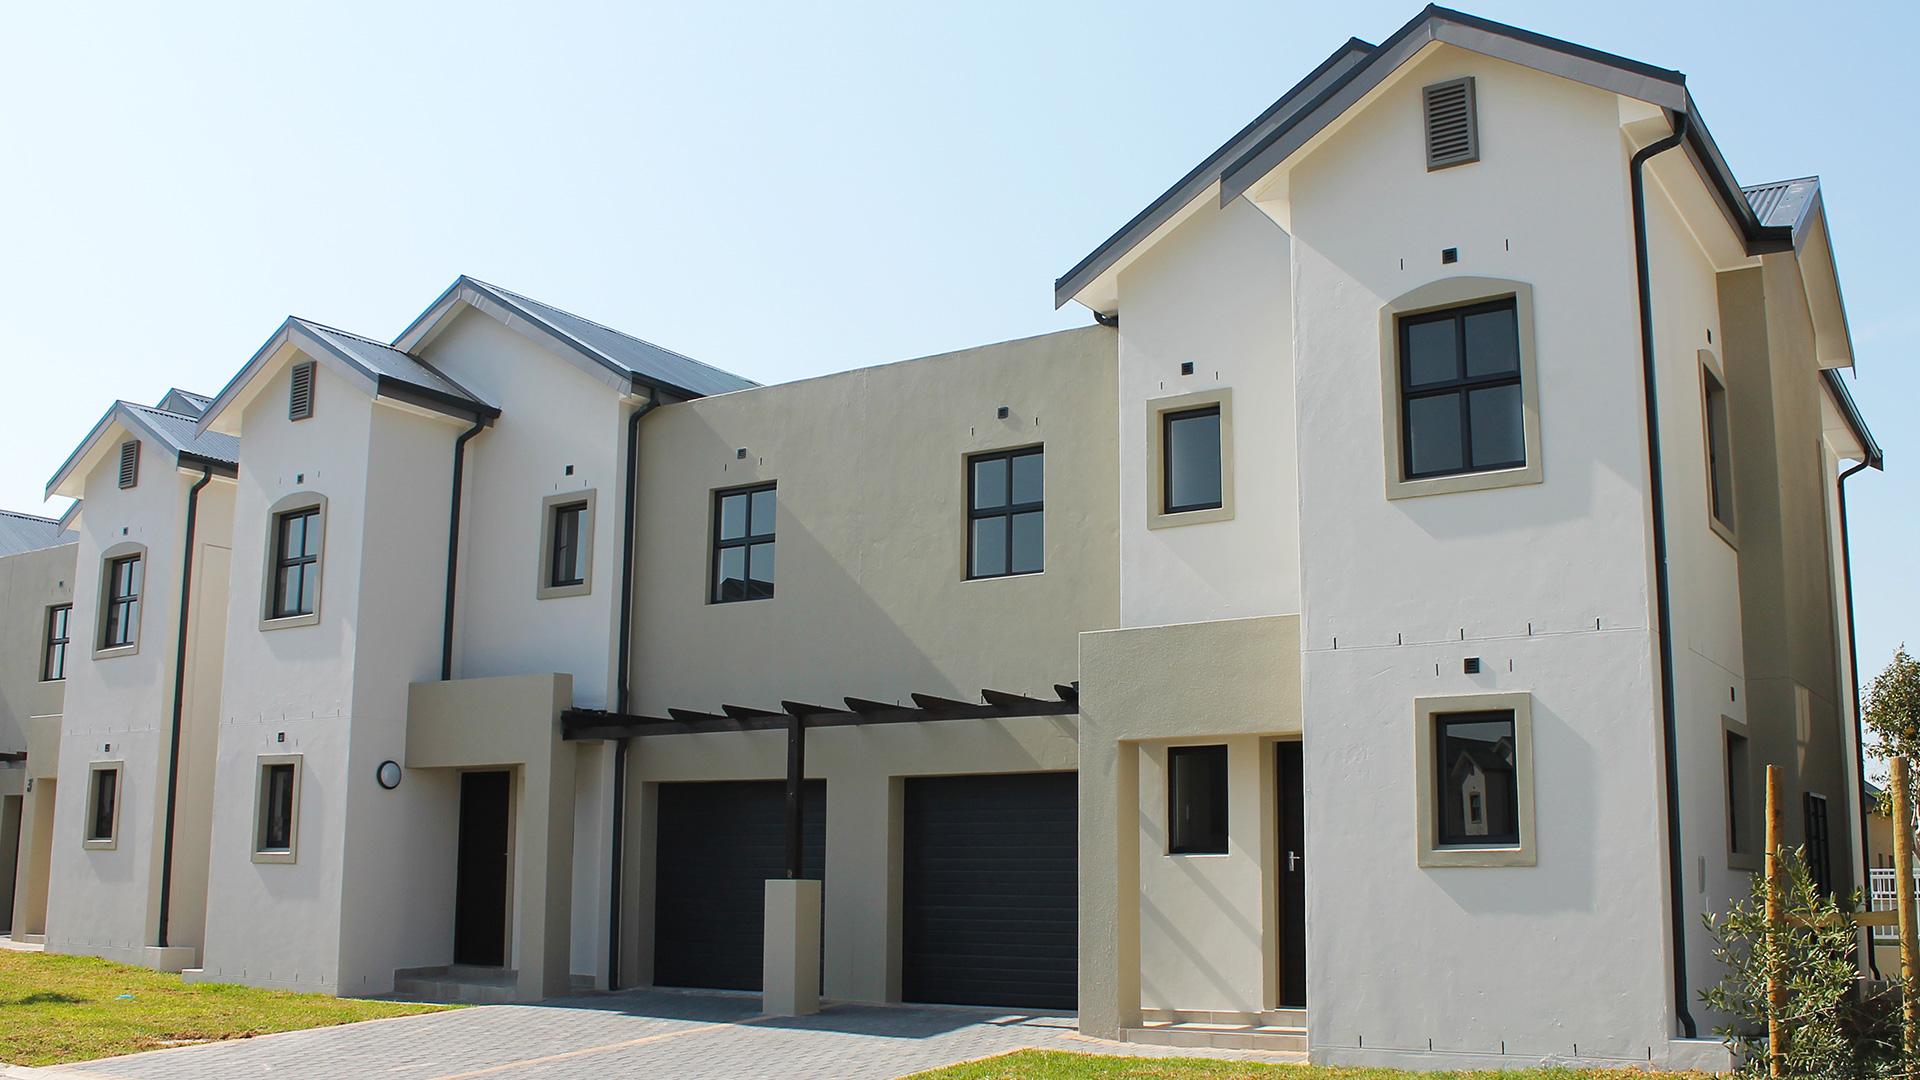 buh-rein-estate-sable-ridge-townhouses-03